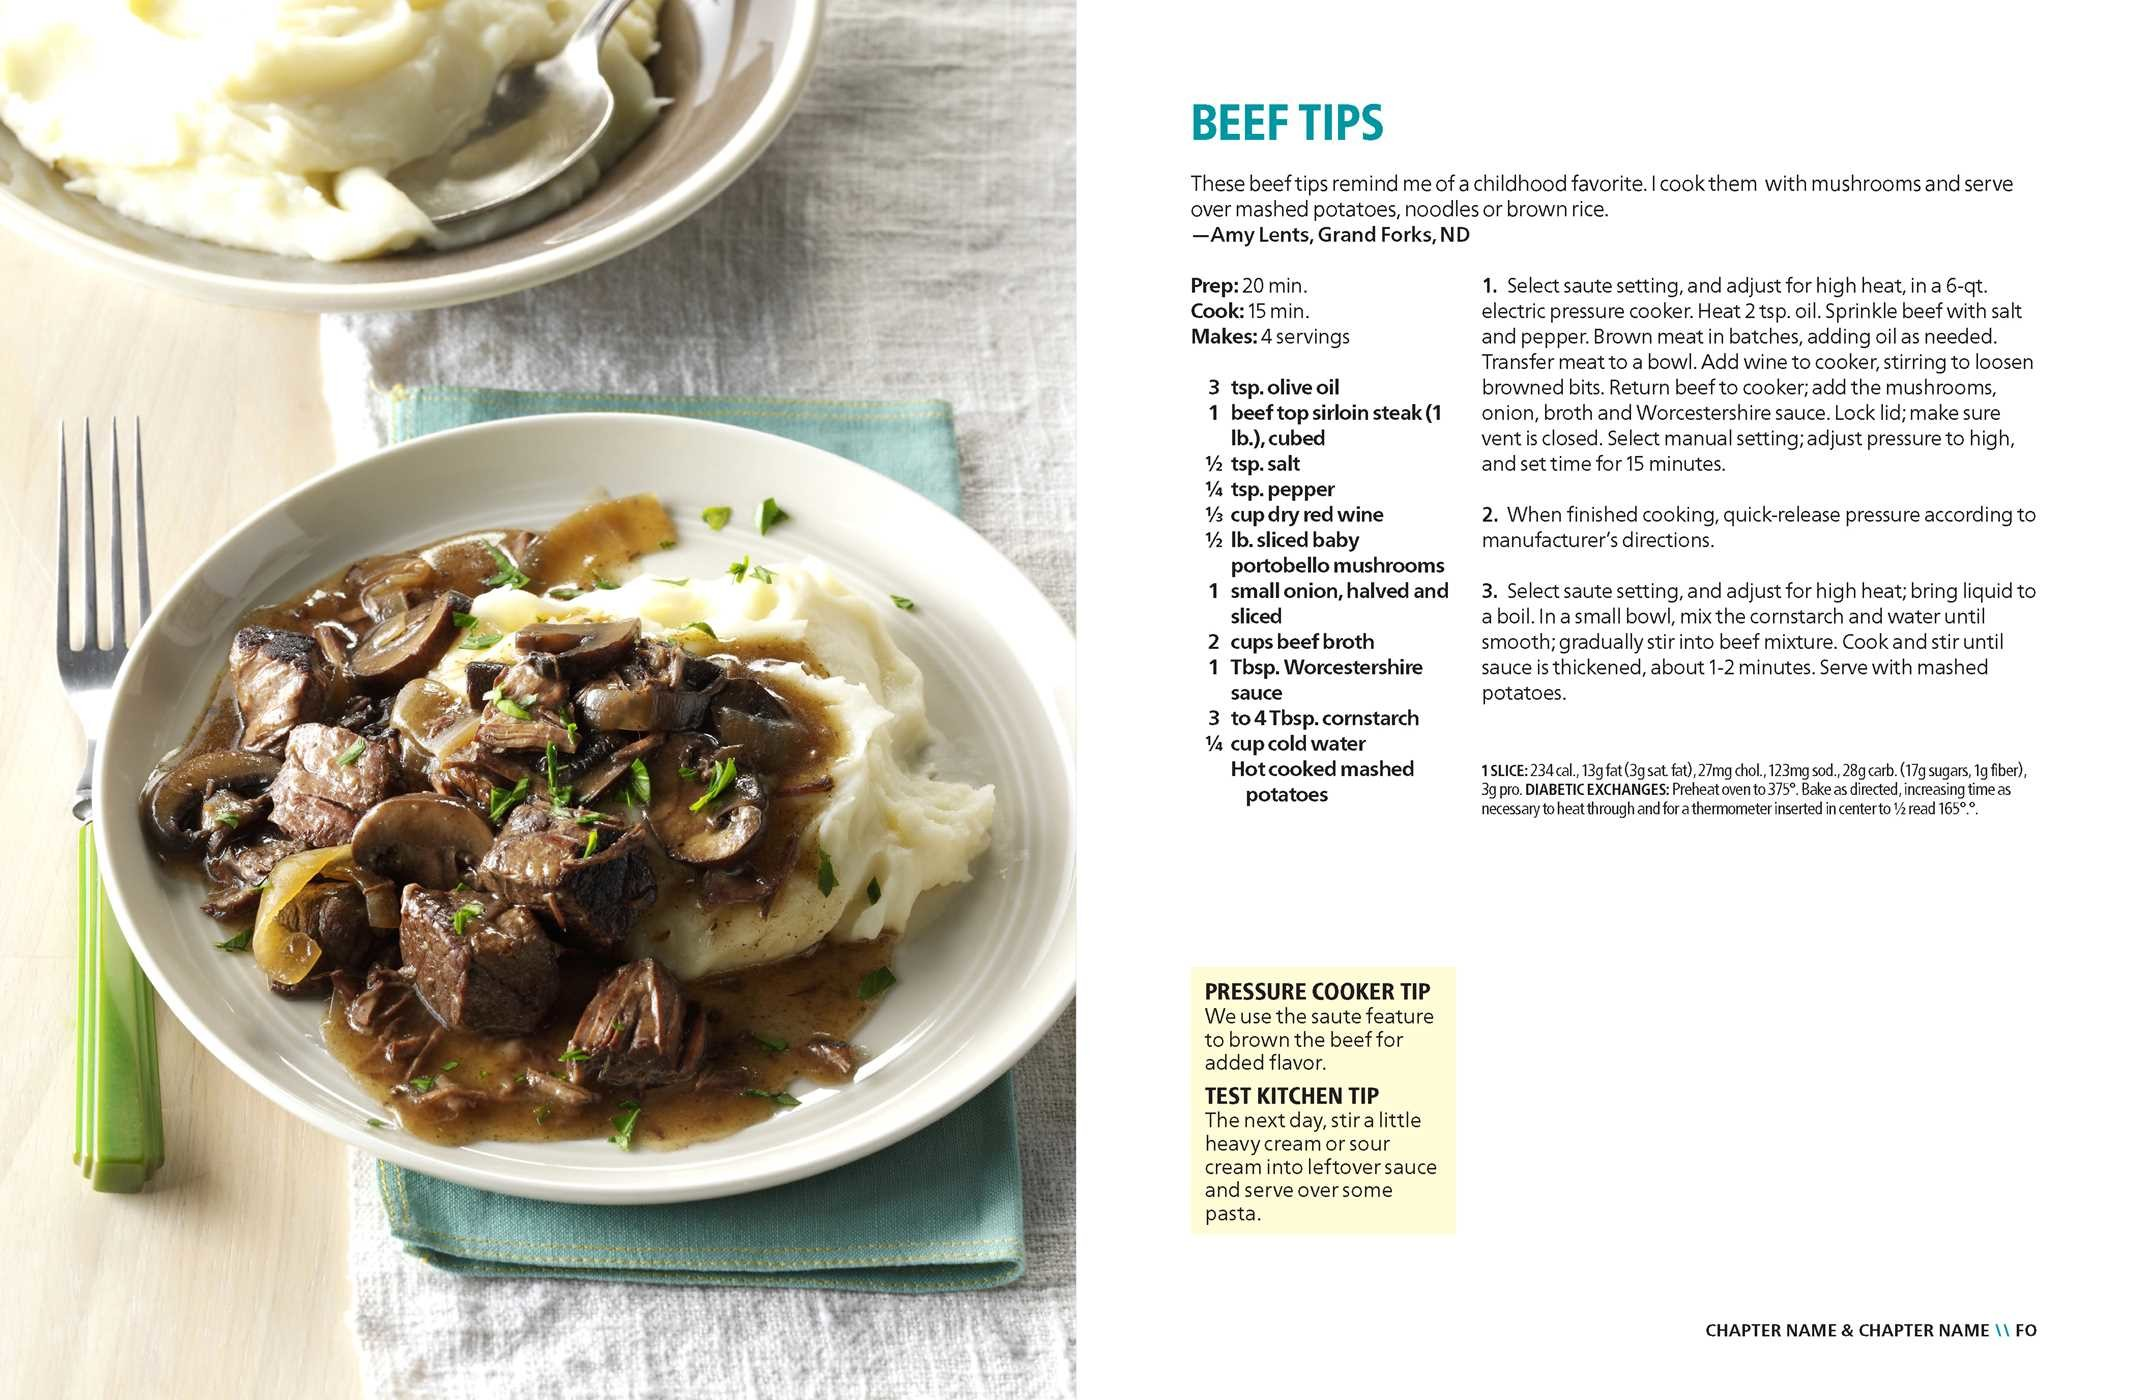 Taste of home instant pot cookbook 9781617657665.in04